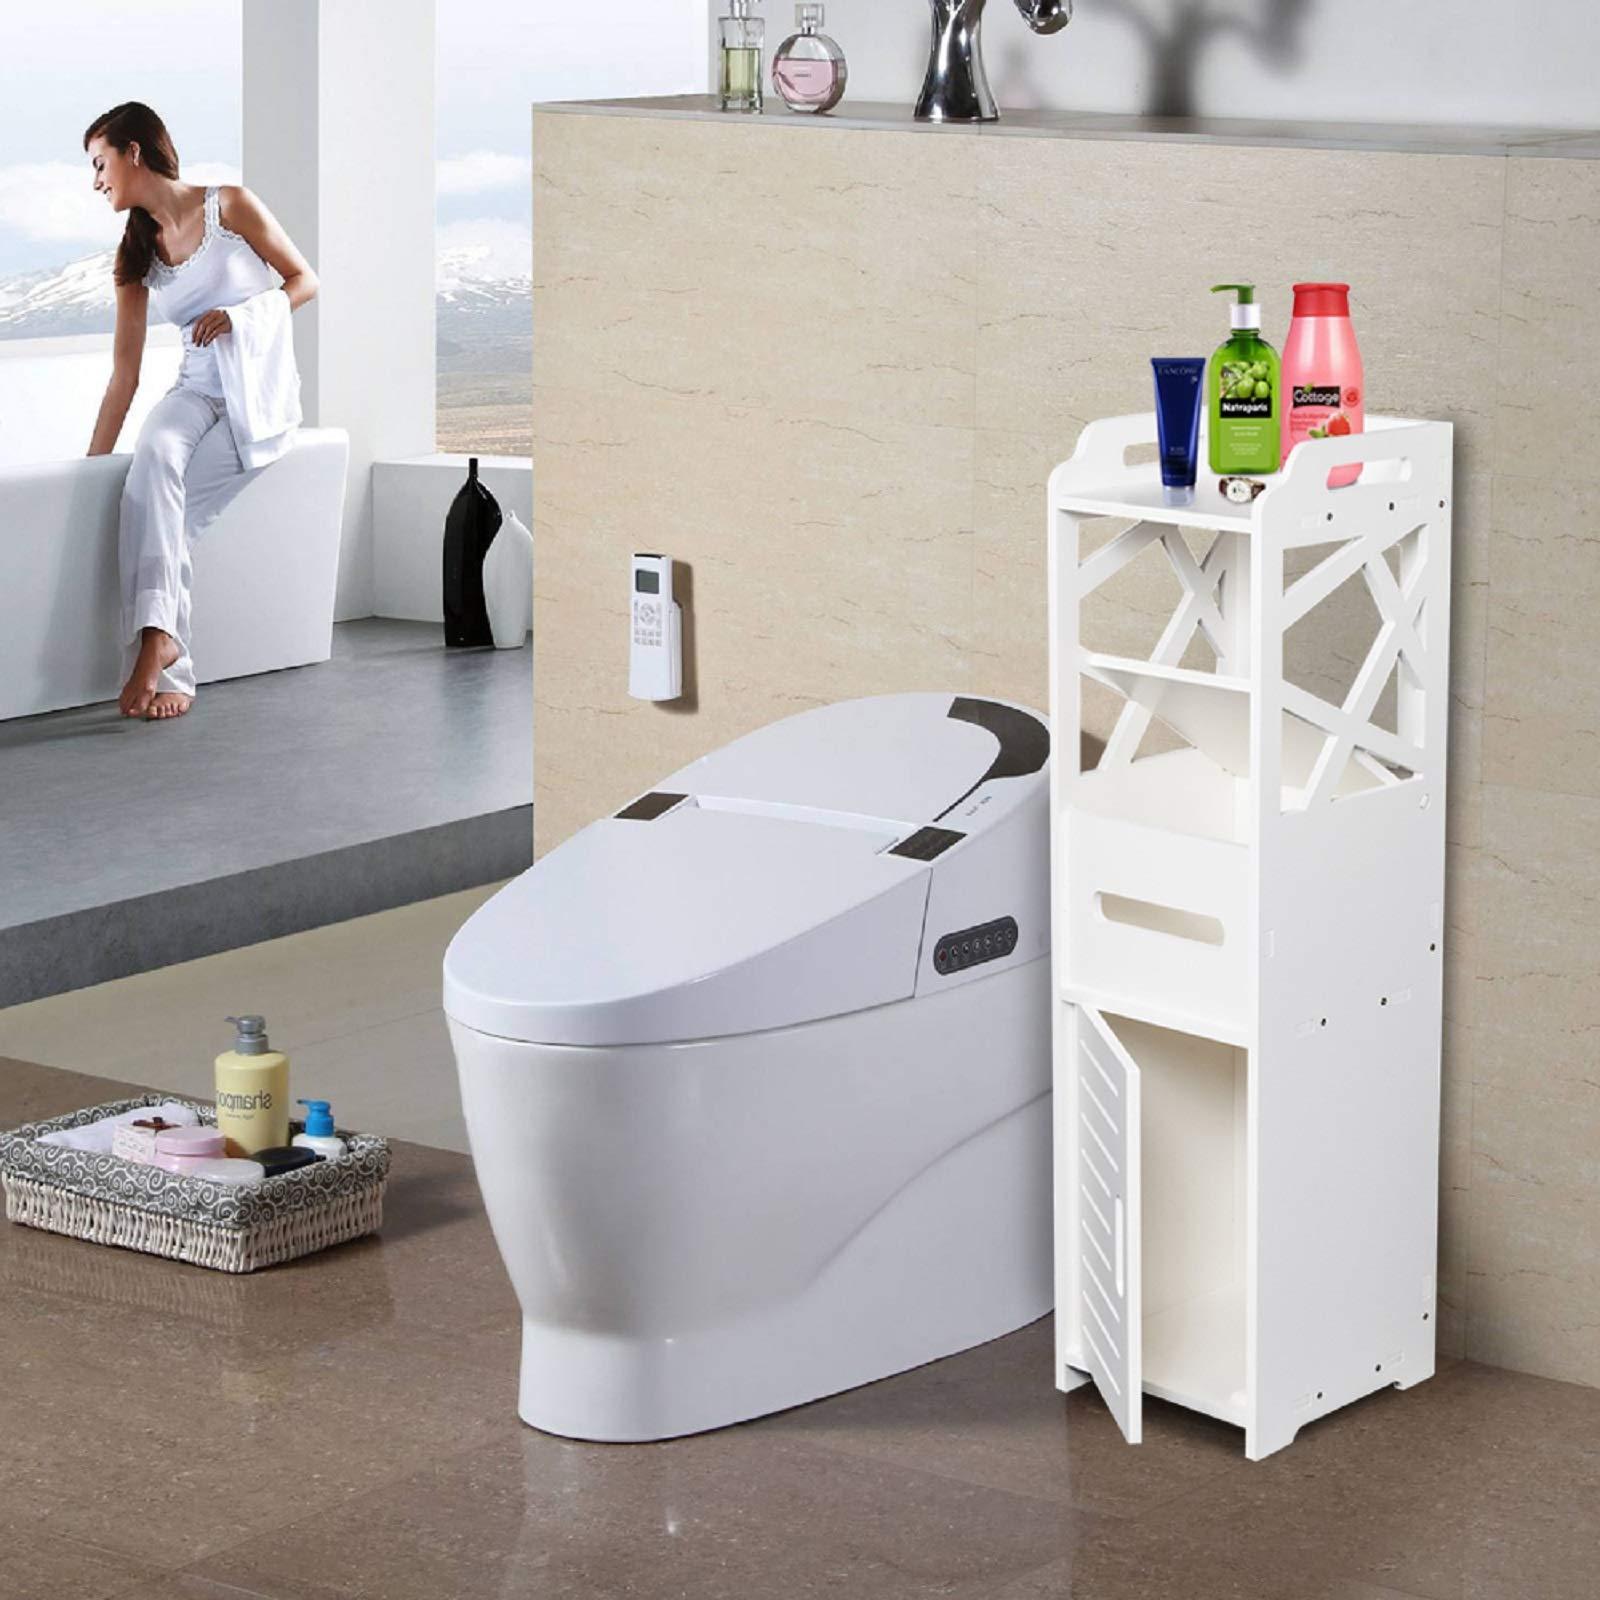 2019 New Bathroom 8'' W x 31.5'' H Cabinet Bathroom Cabinets Multi Compartment 3-Tier Bathroom Storage Cabinet with 2 Doors Medicine Cabinets Bathroom Wall Cabinet Bathroom Shelves Bathroom Furniture